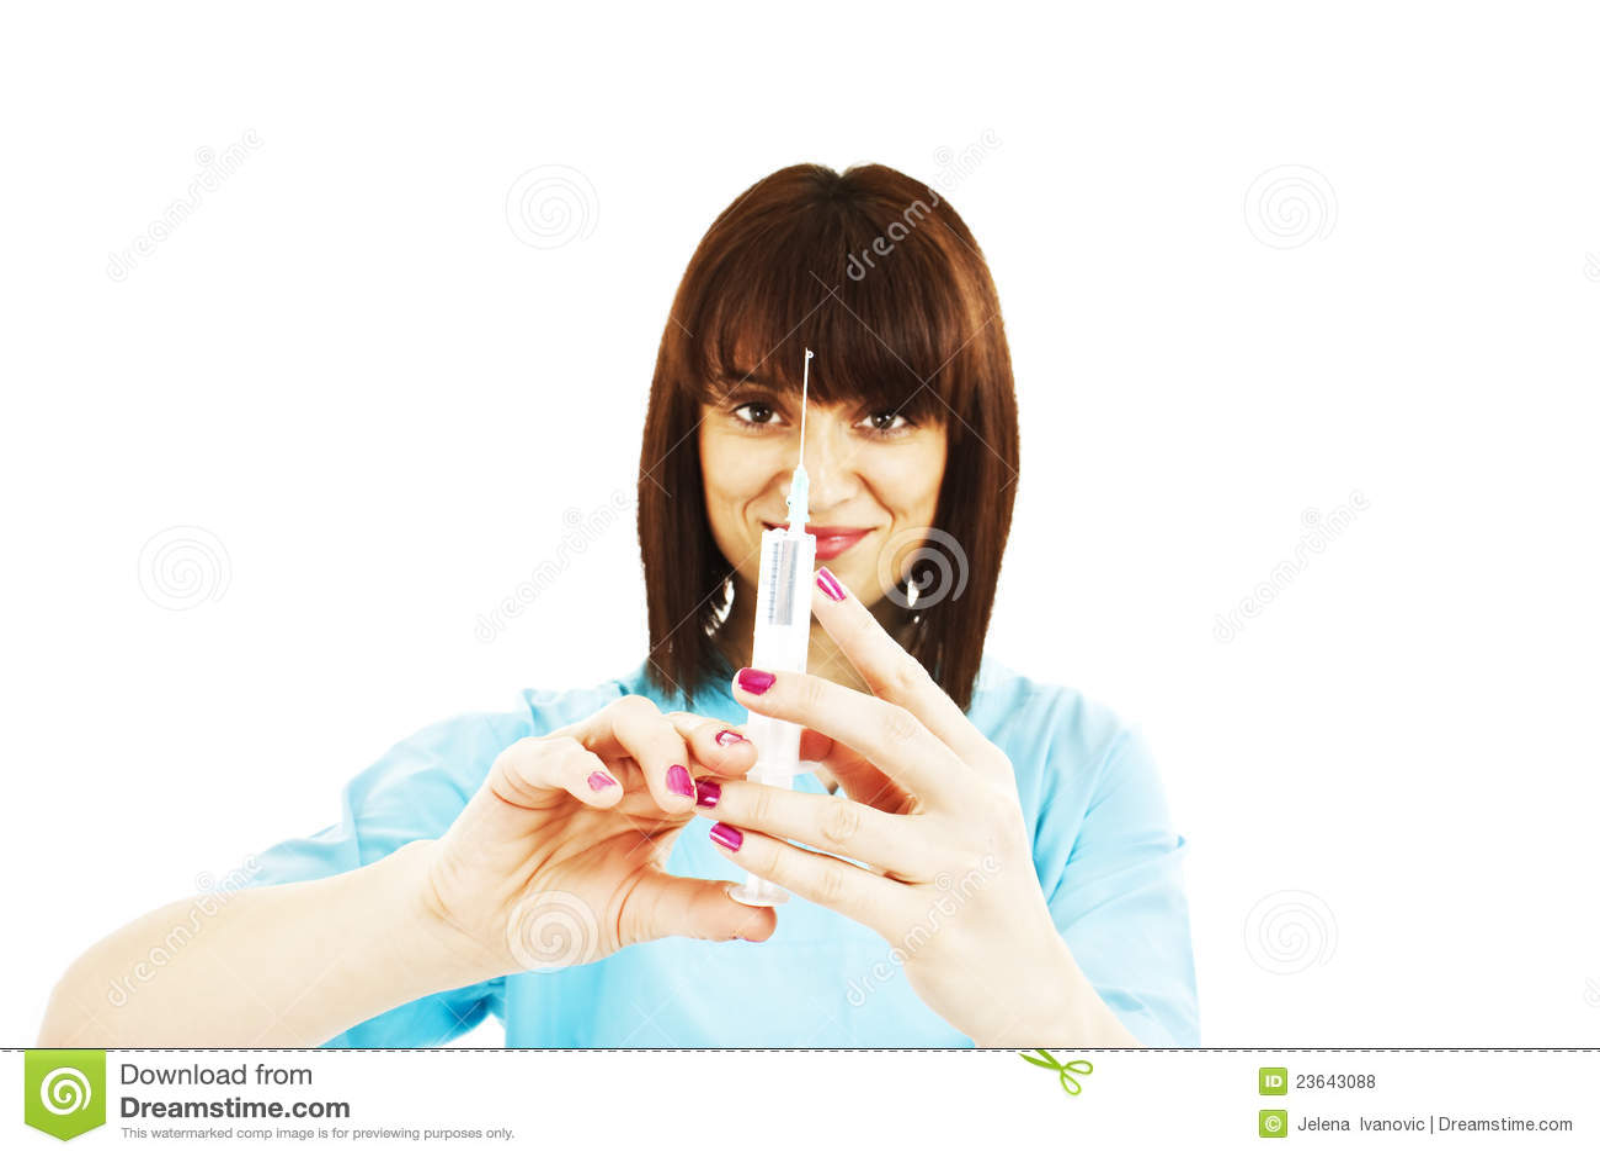 Syringe on girl 6 lechazo a jovencita se dio cuenta